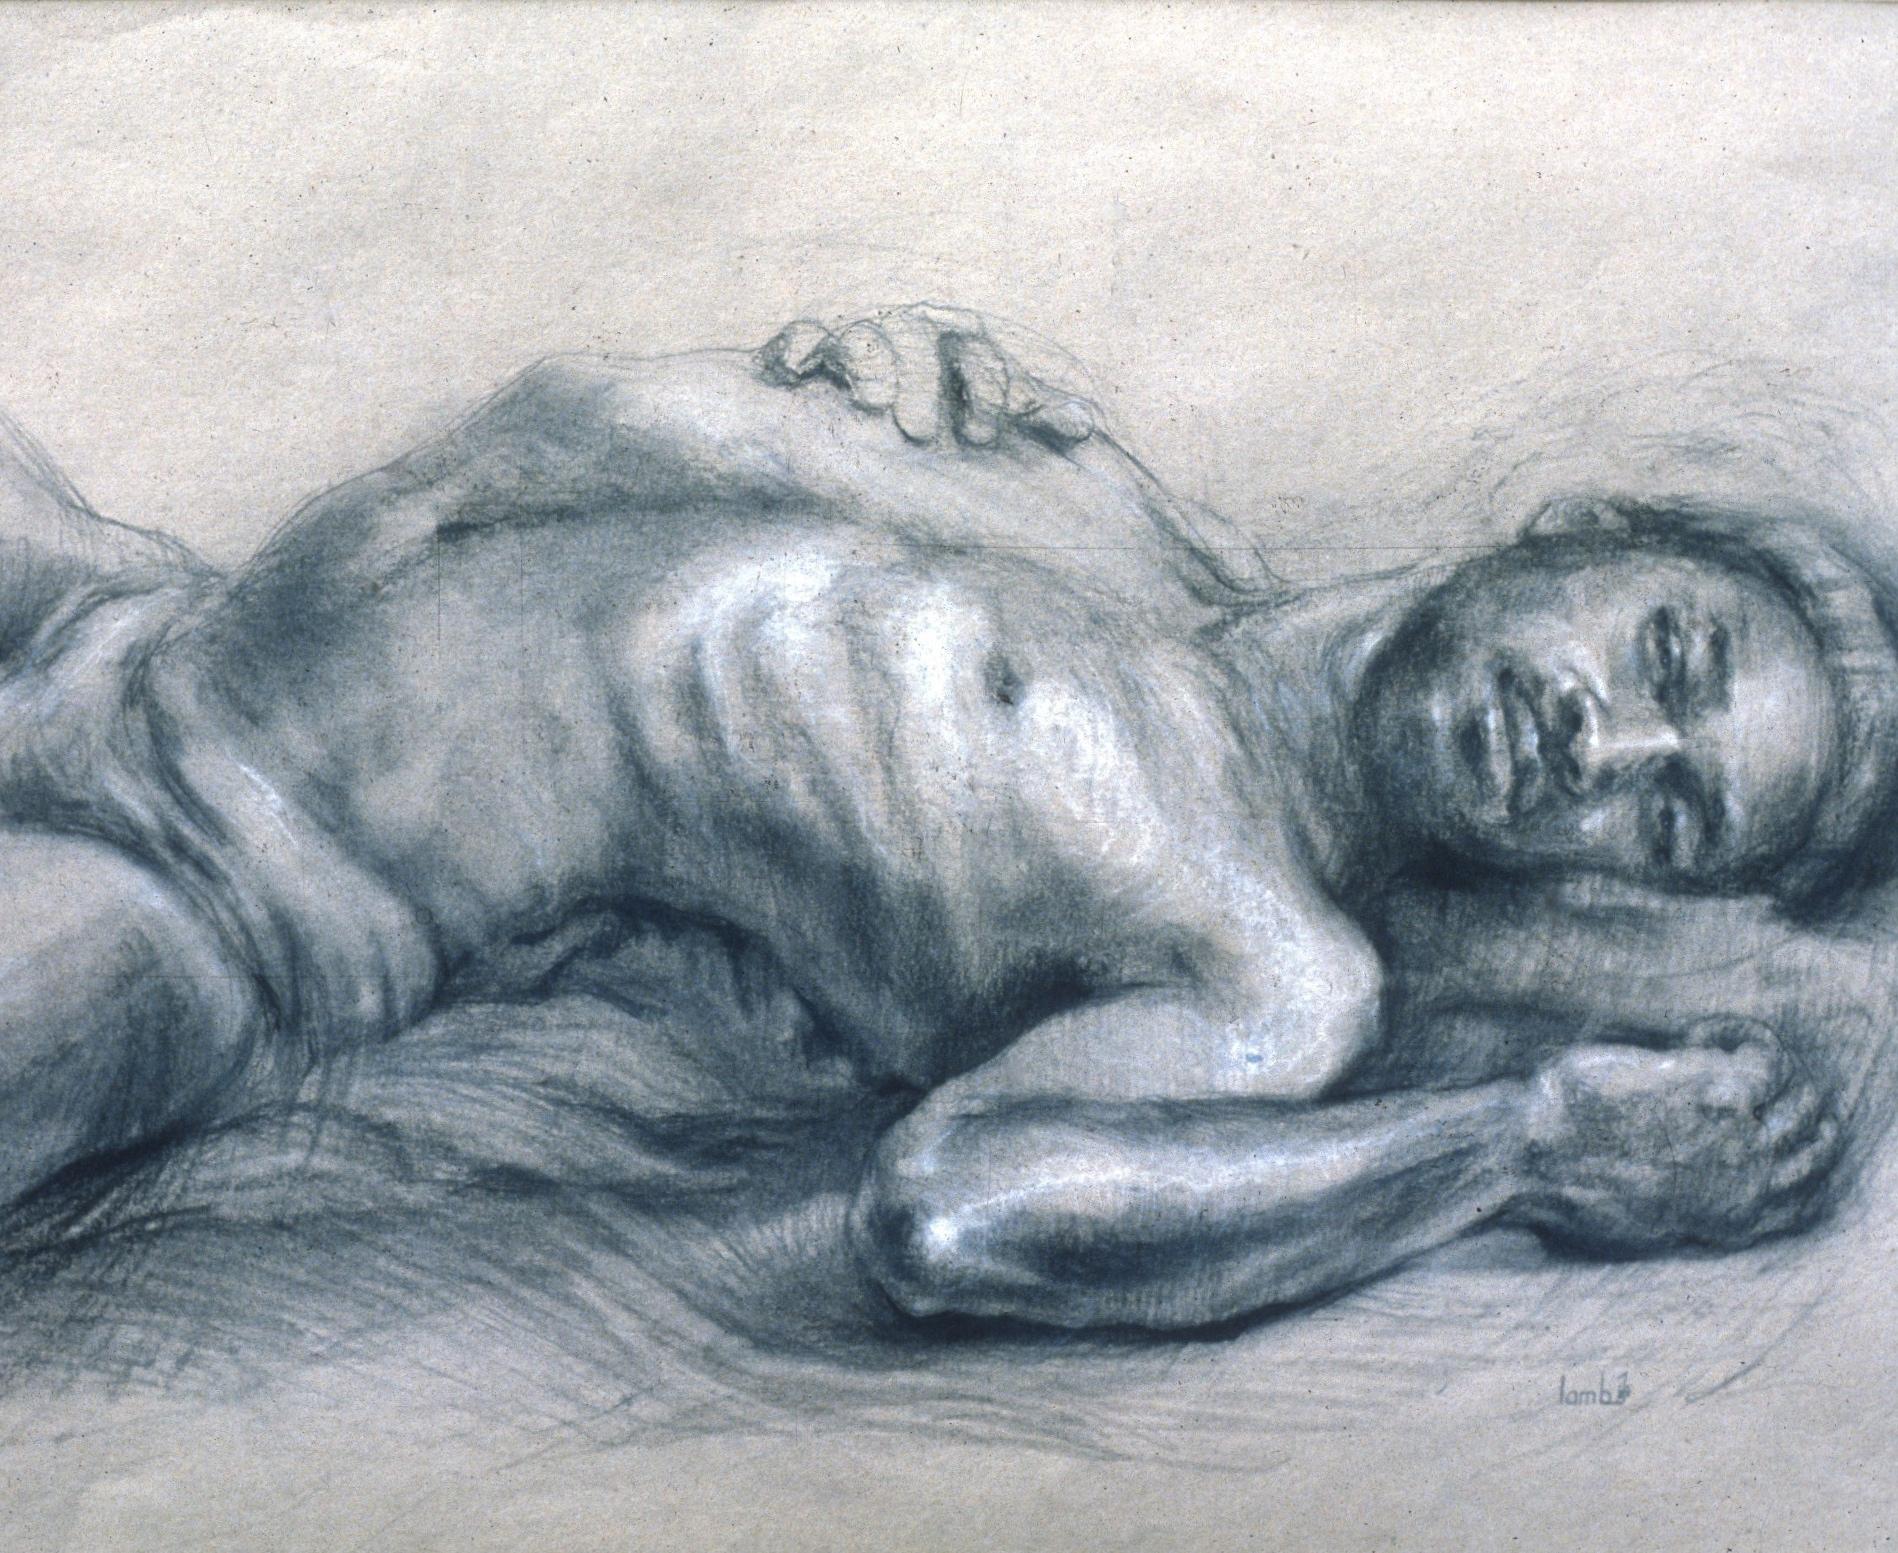 "Lou Ann Burkhardt  Runako Jahid,   1980 Charcoal and white chalk on toned paper 24"" x 30"" framed  $1,600"